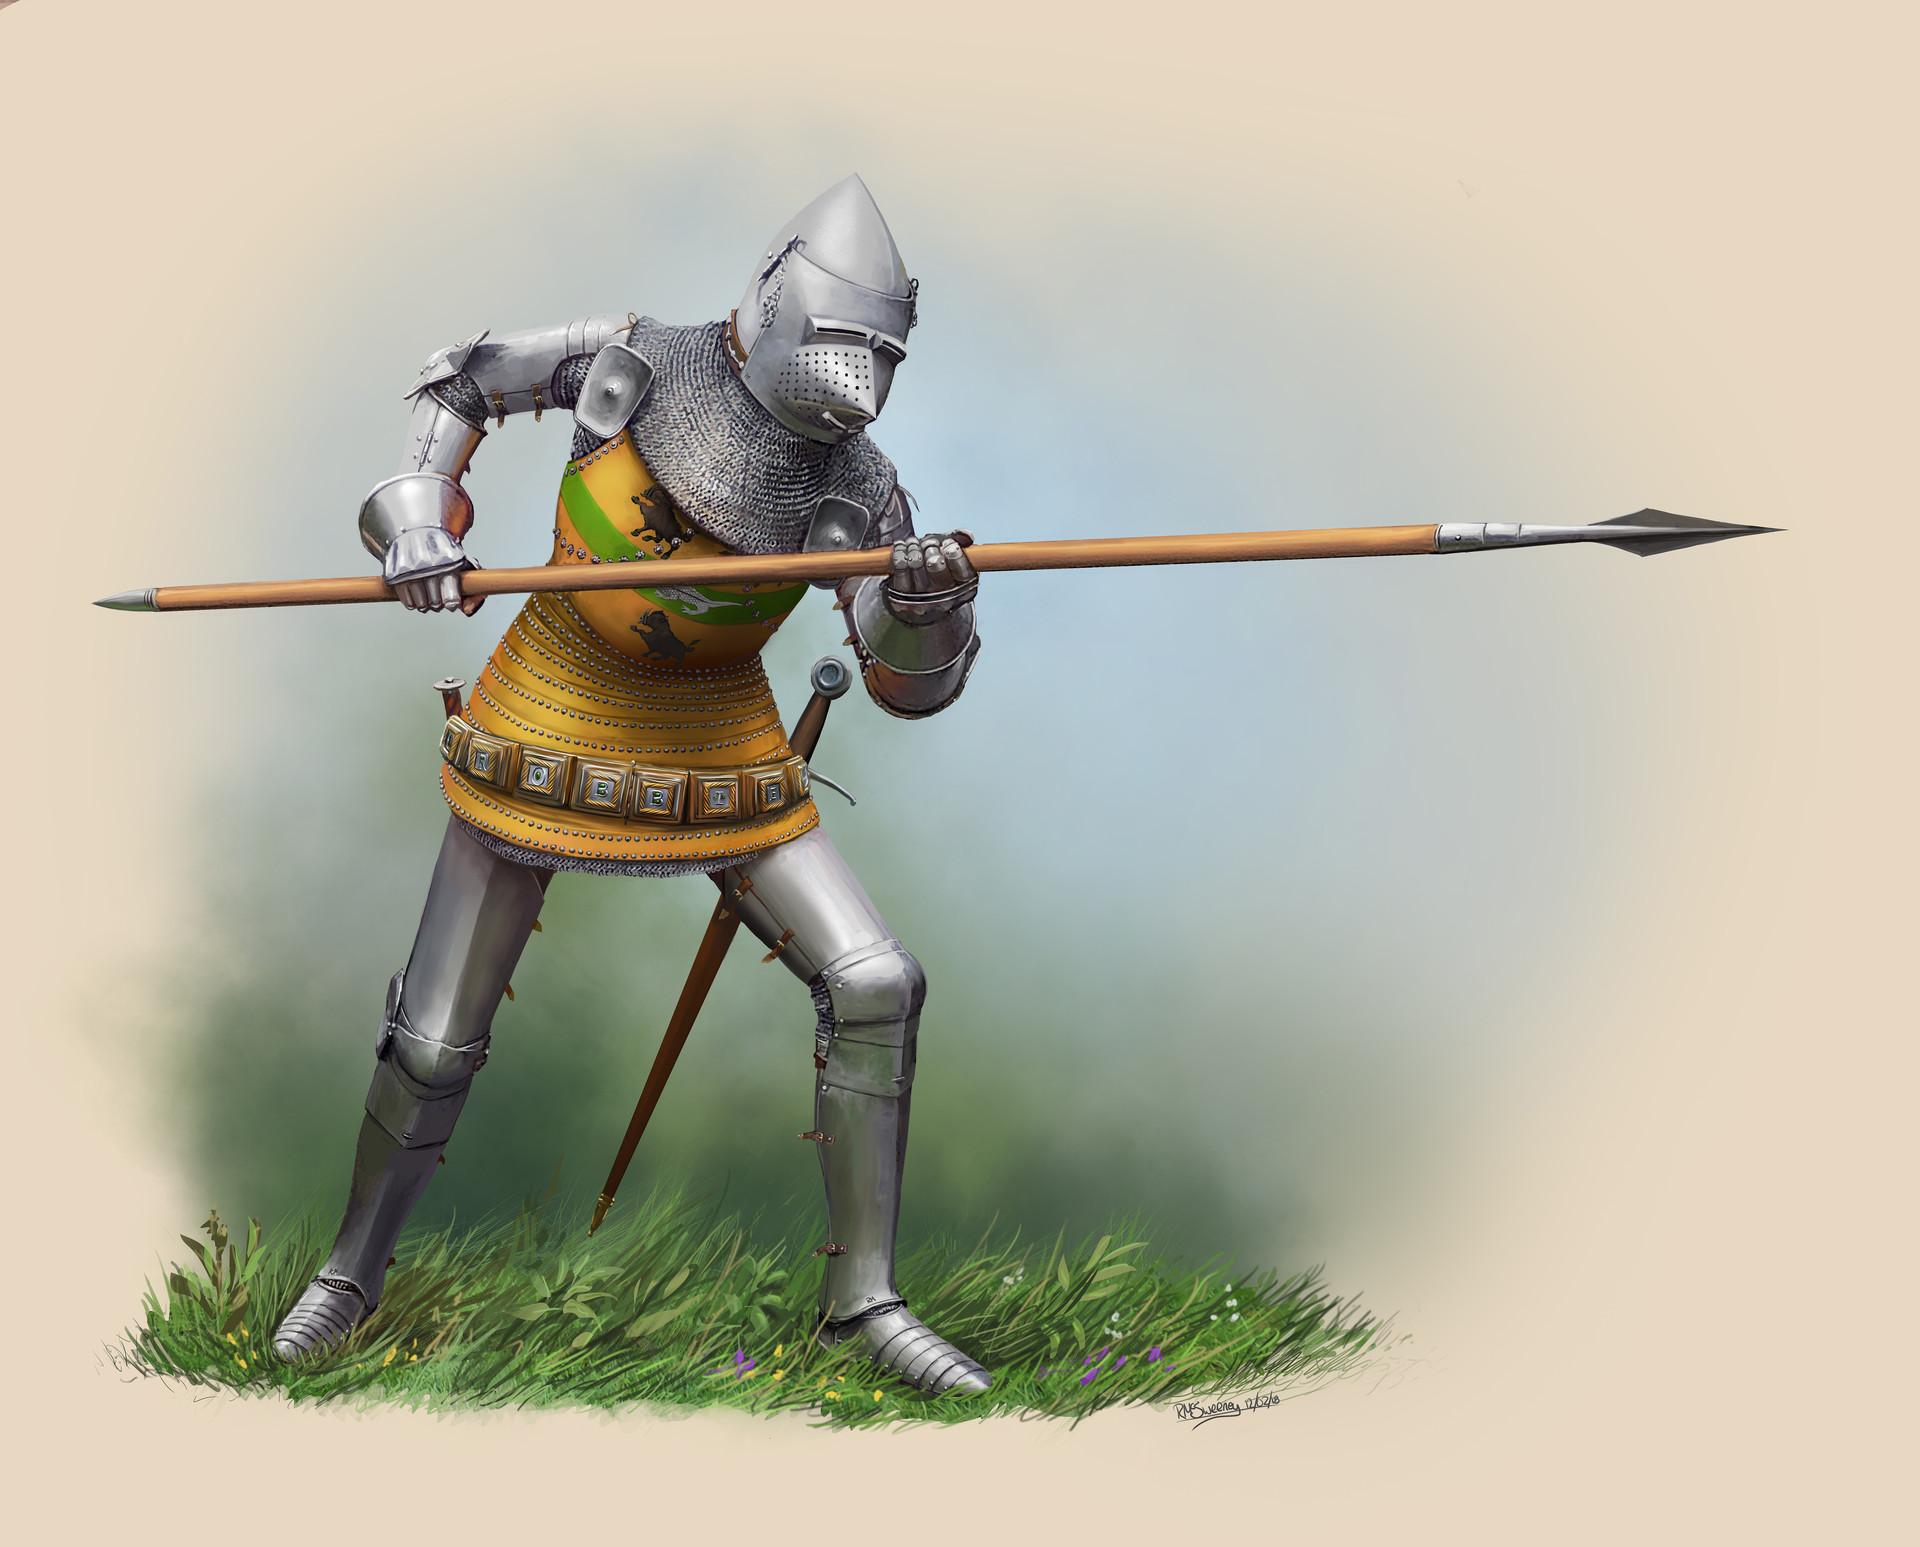 robbie-mcsweeney-14th-century-knight